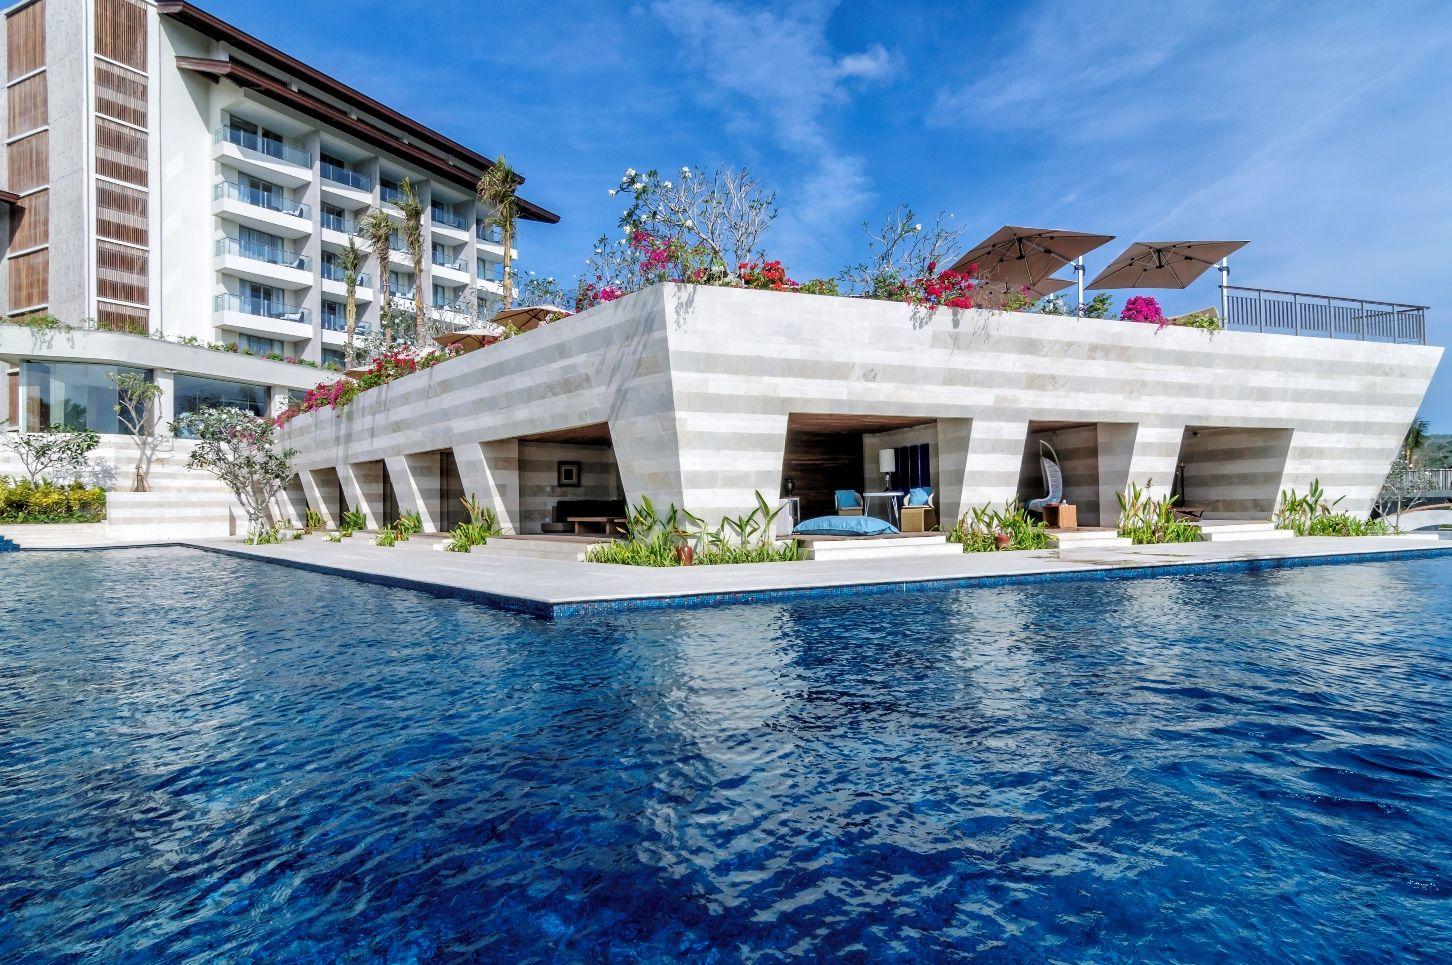 Bali Indonesia Independent Hotels Portfolio Capella Hotel Group Infinity Pool Bali Jimbaran Bali Bali Resort